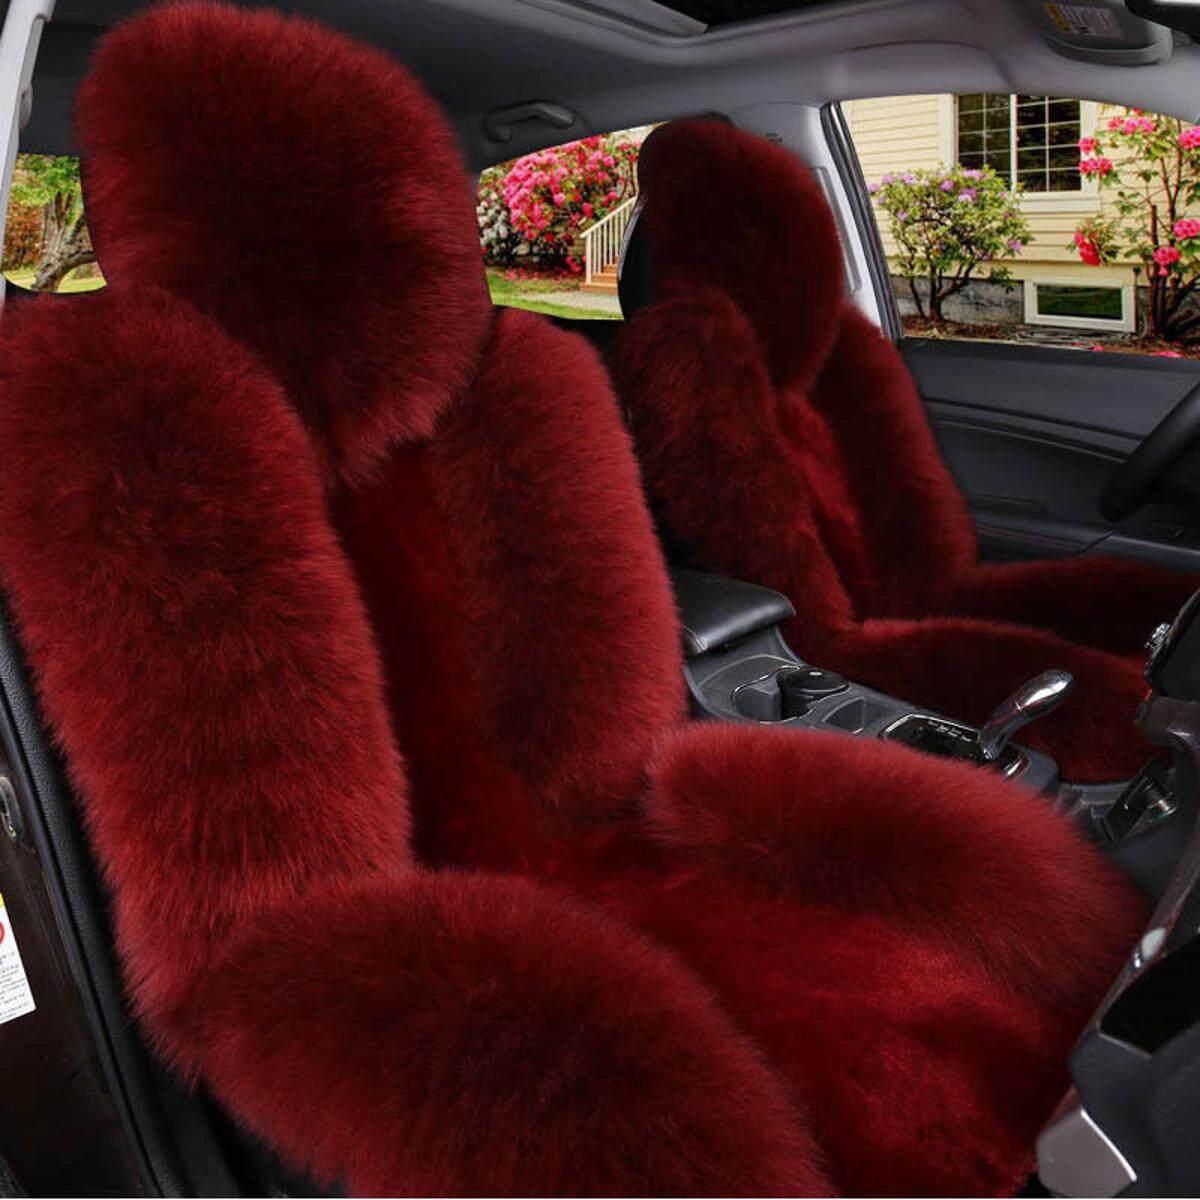 1 PC Mobil Asli Kulit Domba Australia Depan Kursi Sarung Panjang Wol Bulu Merah-Warna